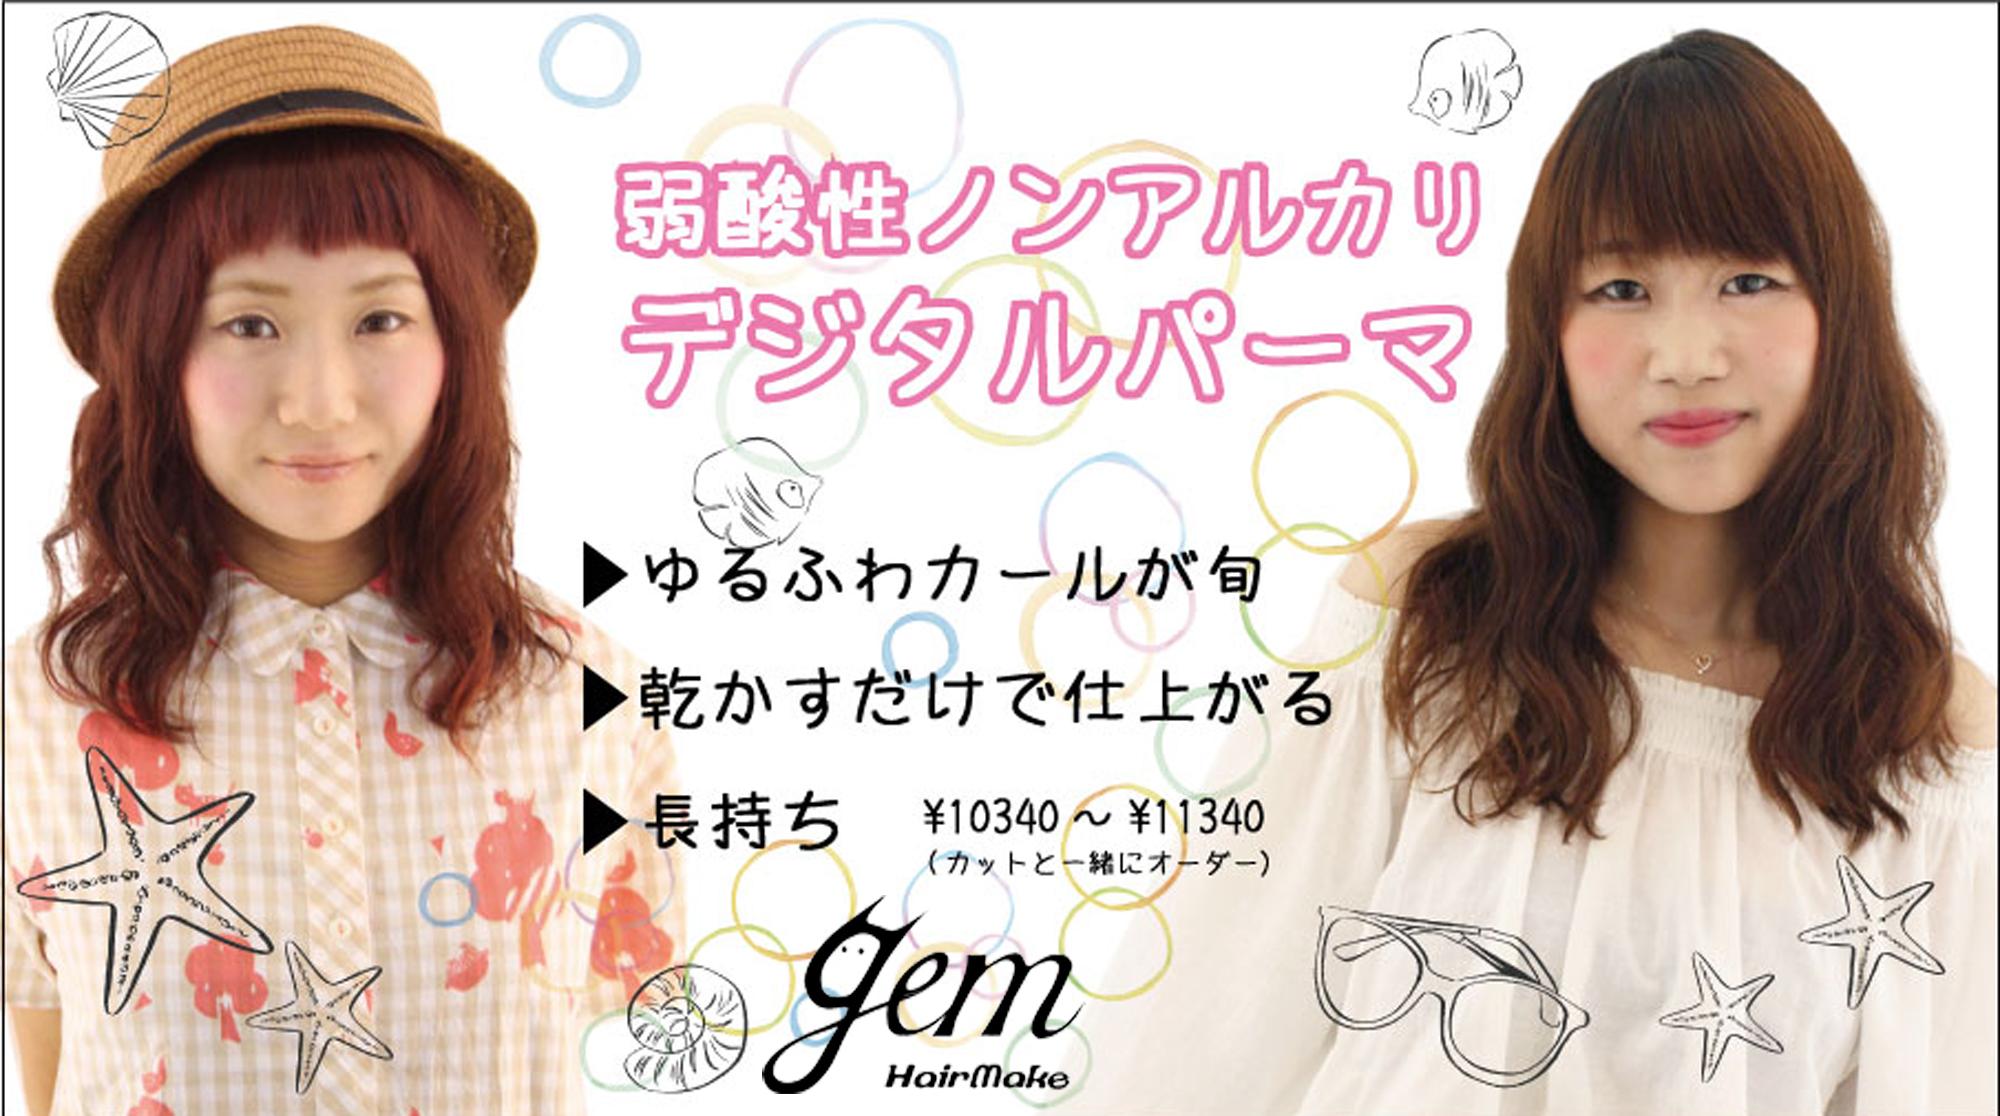 http://www.b2c.jp/blog/img/gemp.jpg